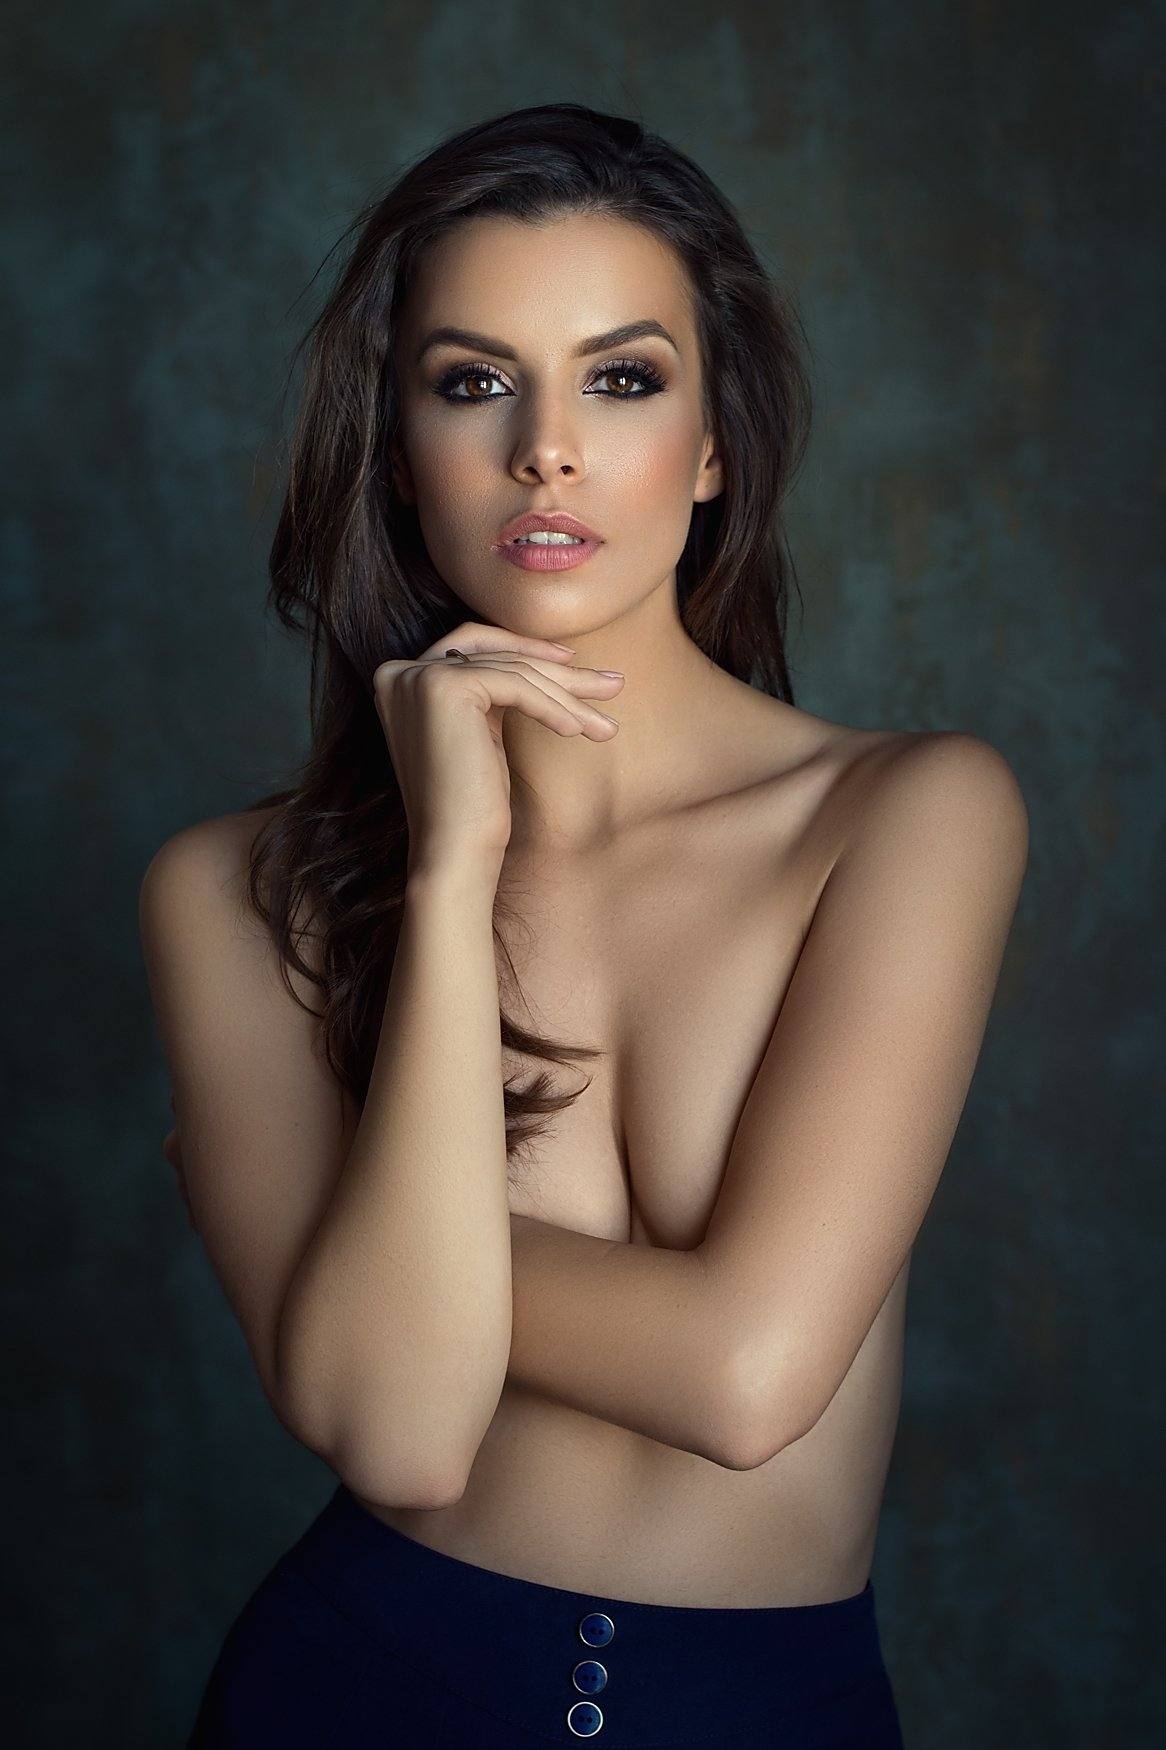 model, glamour, woman, female, colour, body, sexy, sensual,  curves, portrait, erotica,  fine art, implied nude, hair, fashion, fashion nude, portrait, natural light, red lips, beautiful,, Lajos Csáki